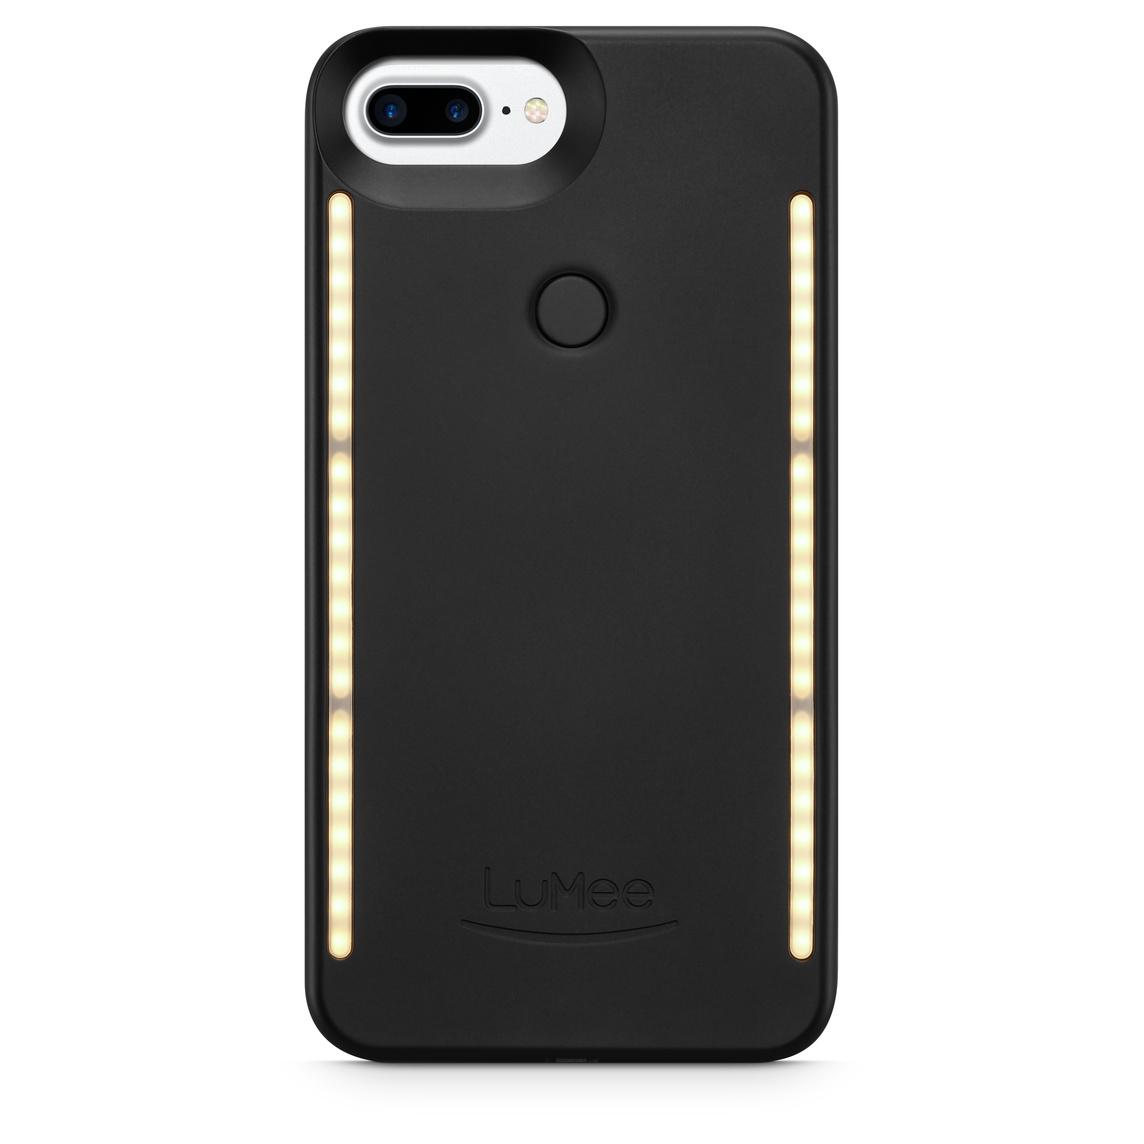 cheap for discount b5e08 847b7 Capa iluminadora com LED Duo da LuMee para iPhone 8 Plus/7 Plus